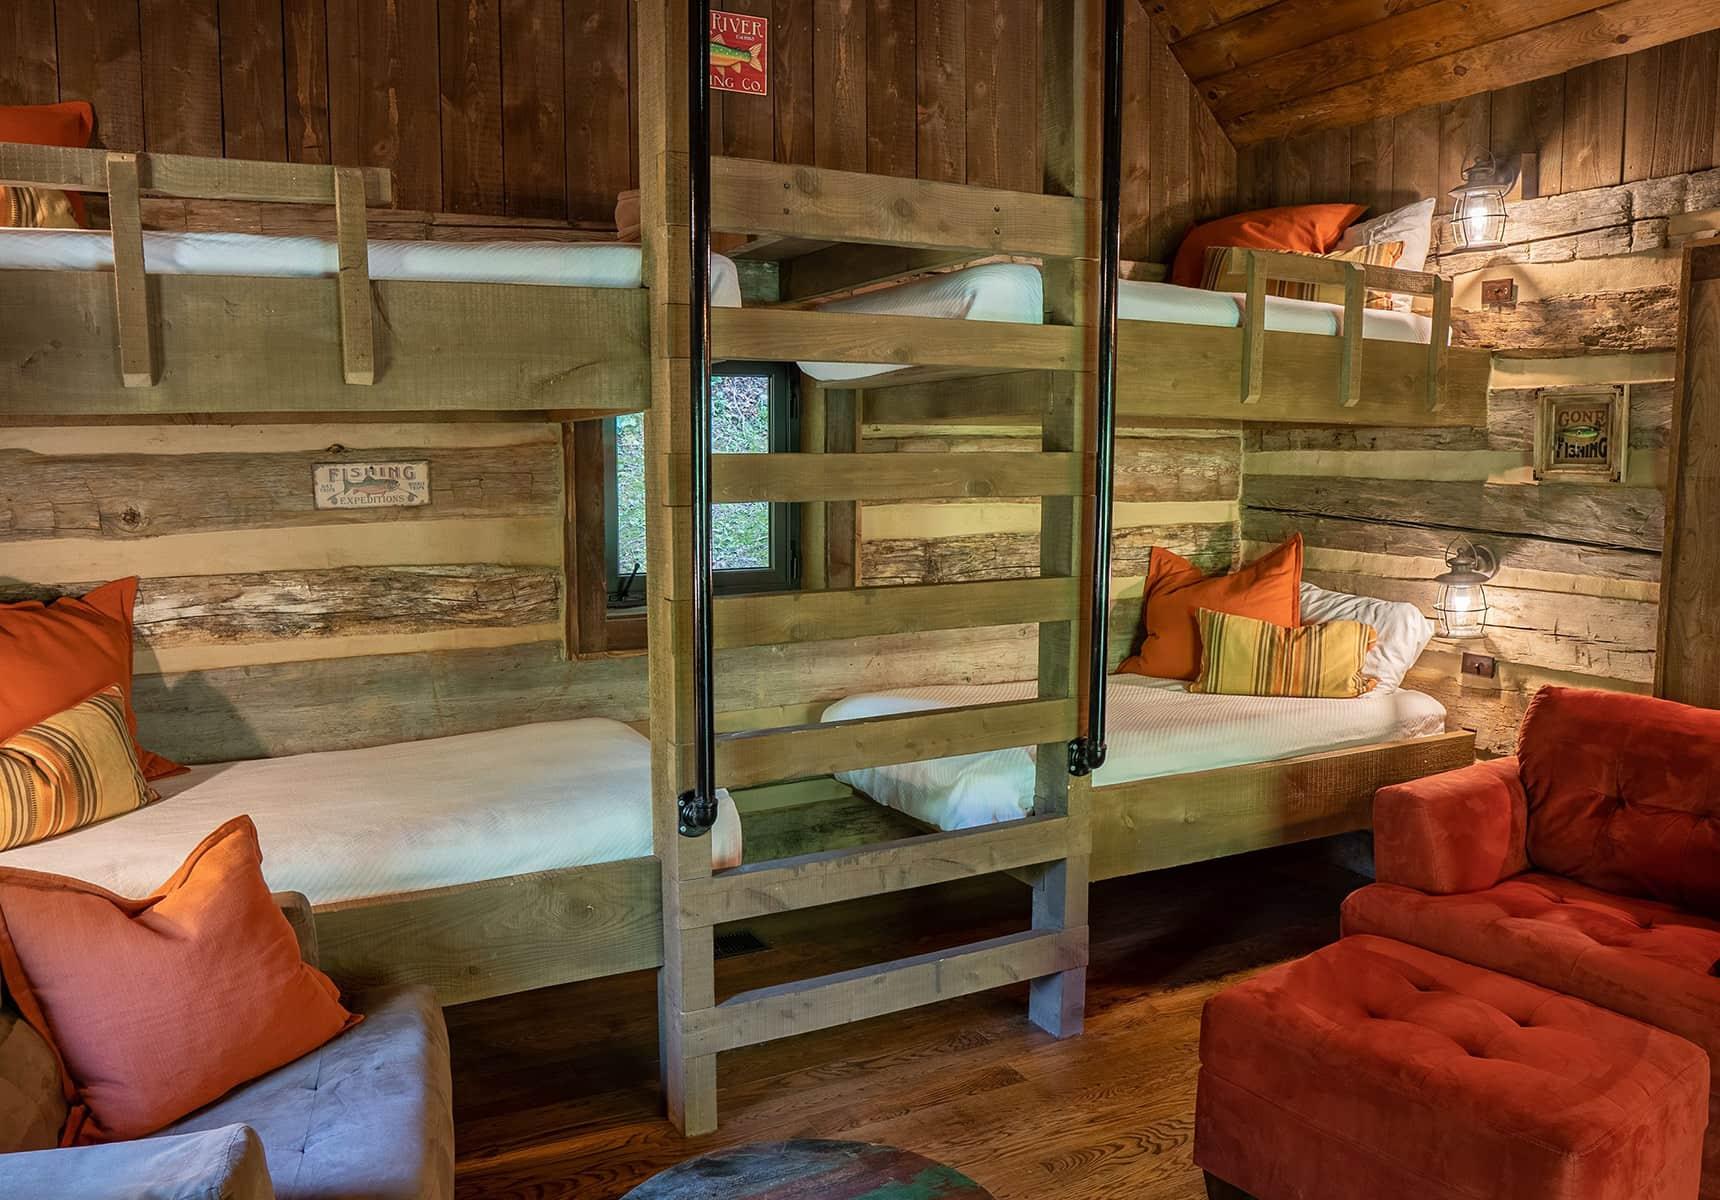 Fishing Creek Cabin bunks - Vacation Rentals in West Virginia